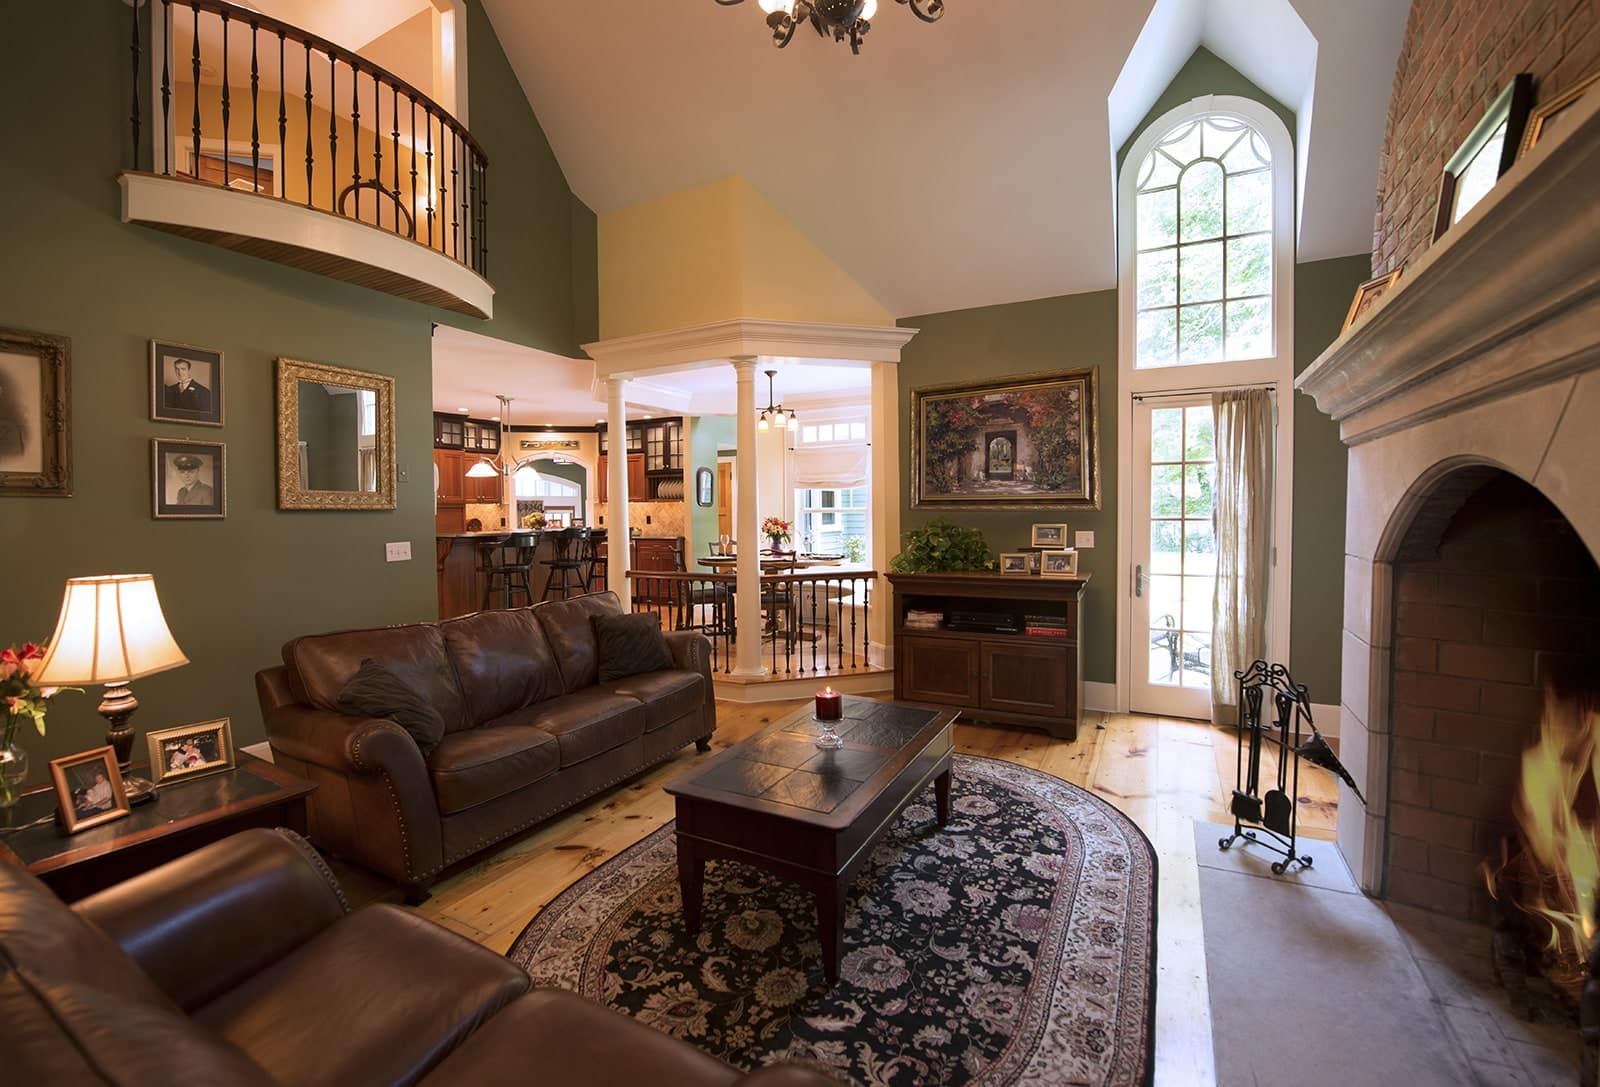 Eclectic Elegance Ipswich MA Living Room